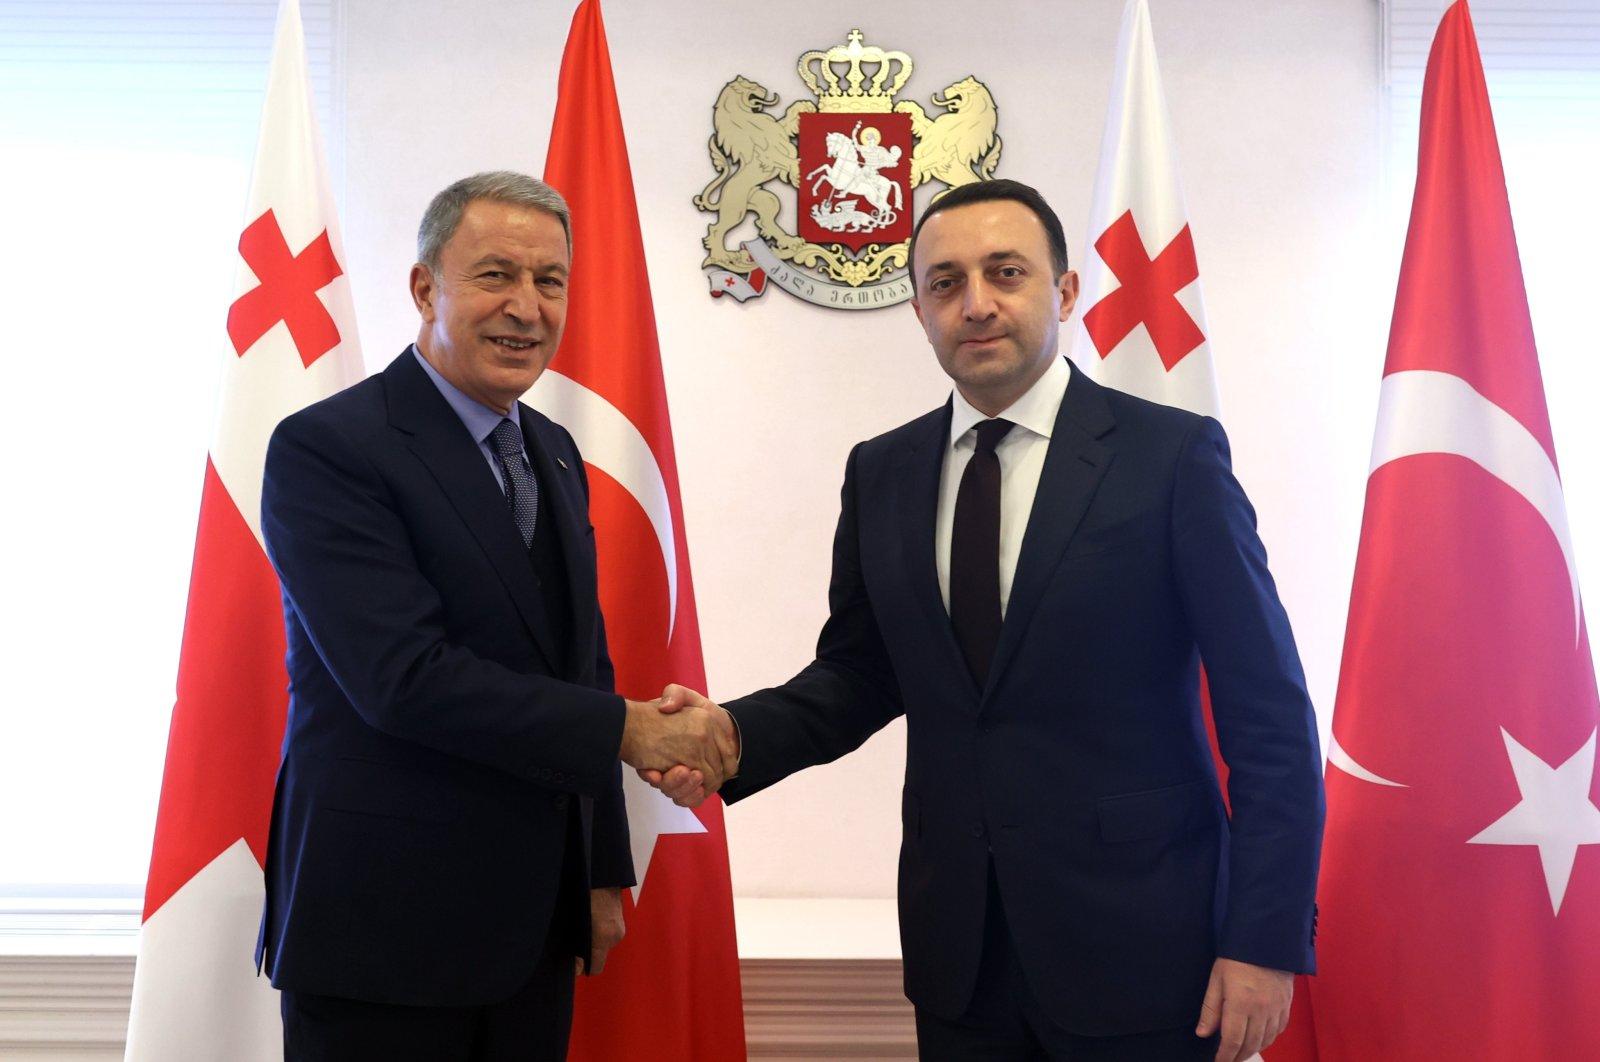 Defense Minister Hulusi Akar shakes hands with Georgian PM Garibashvili in Tibilisi, Monday, Oct. 4, 2021. (AA Photo)